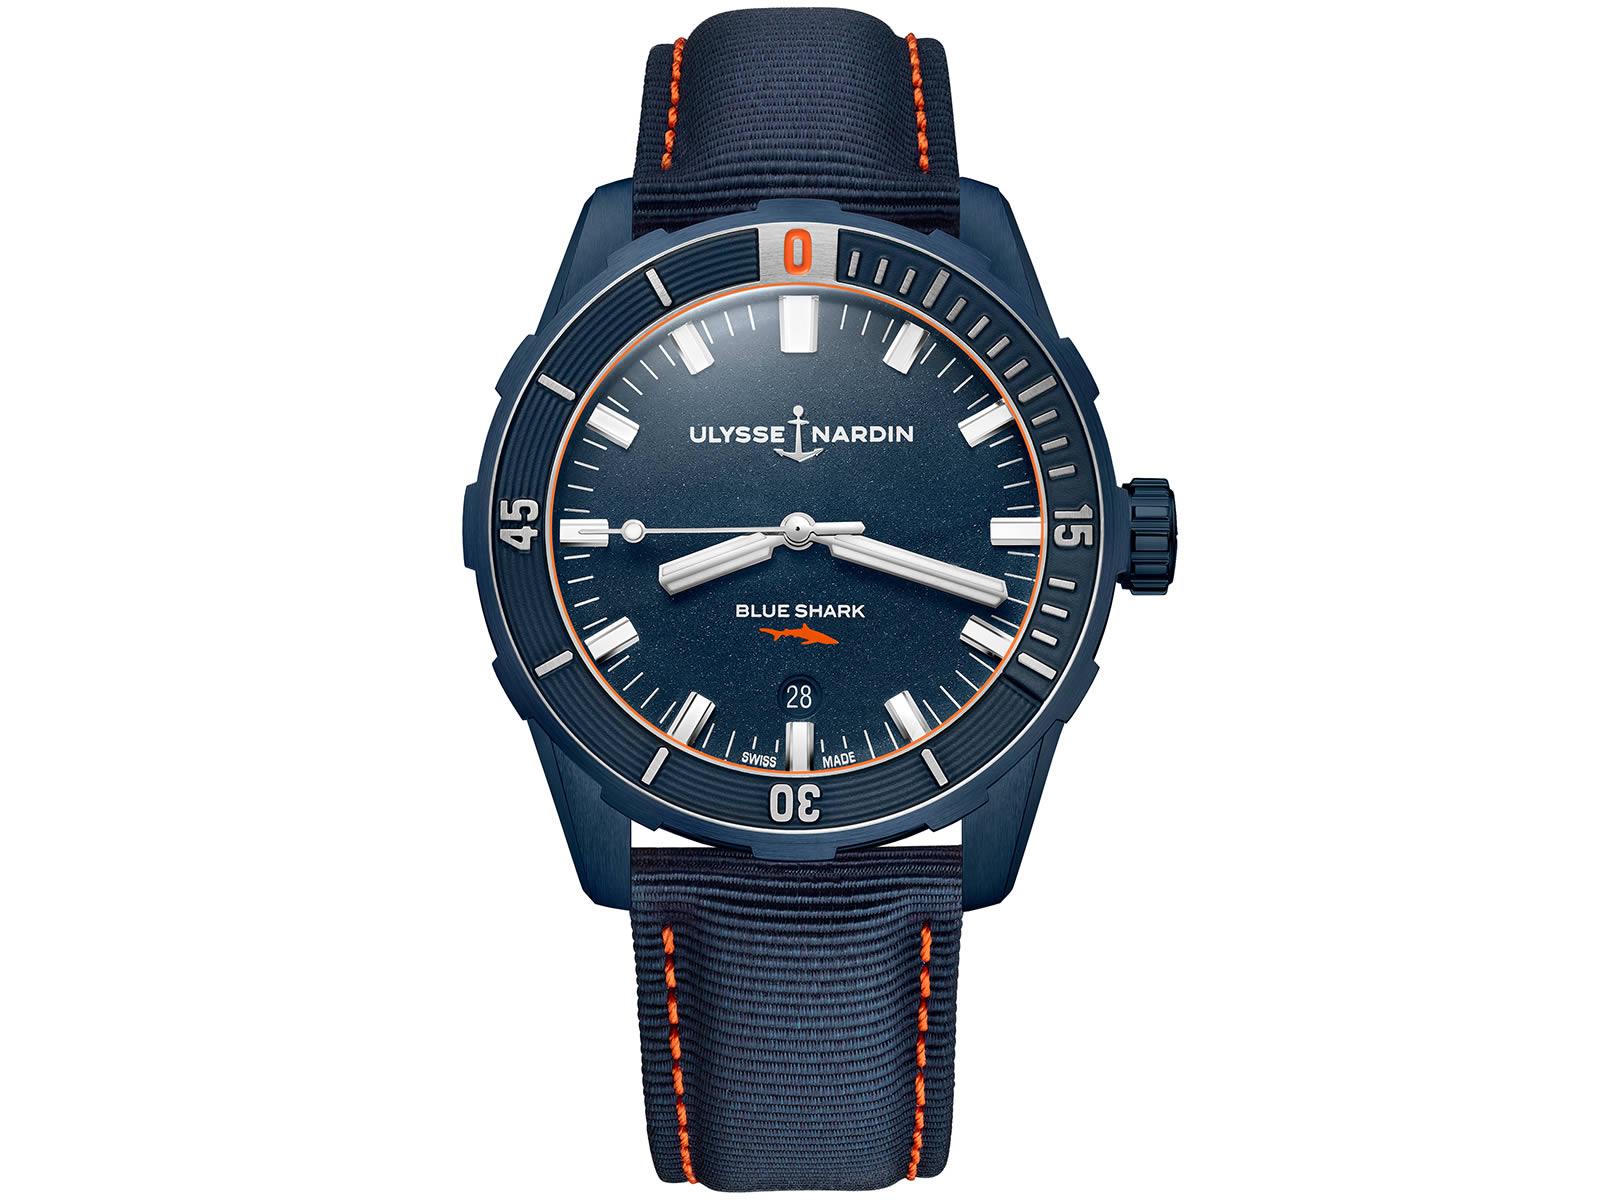 8163-175le-93-blueshark-ulysse-nardin-diver-42mm-1-.jpg